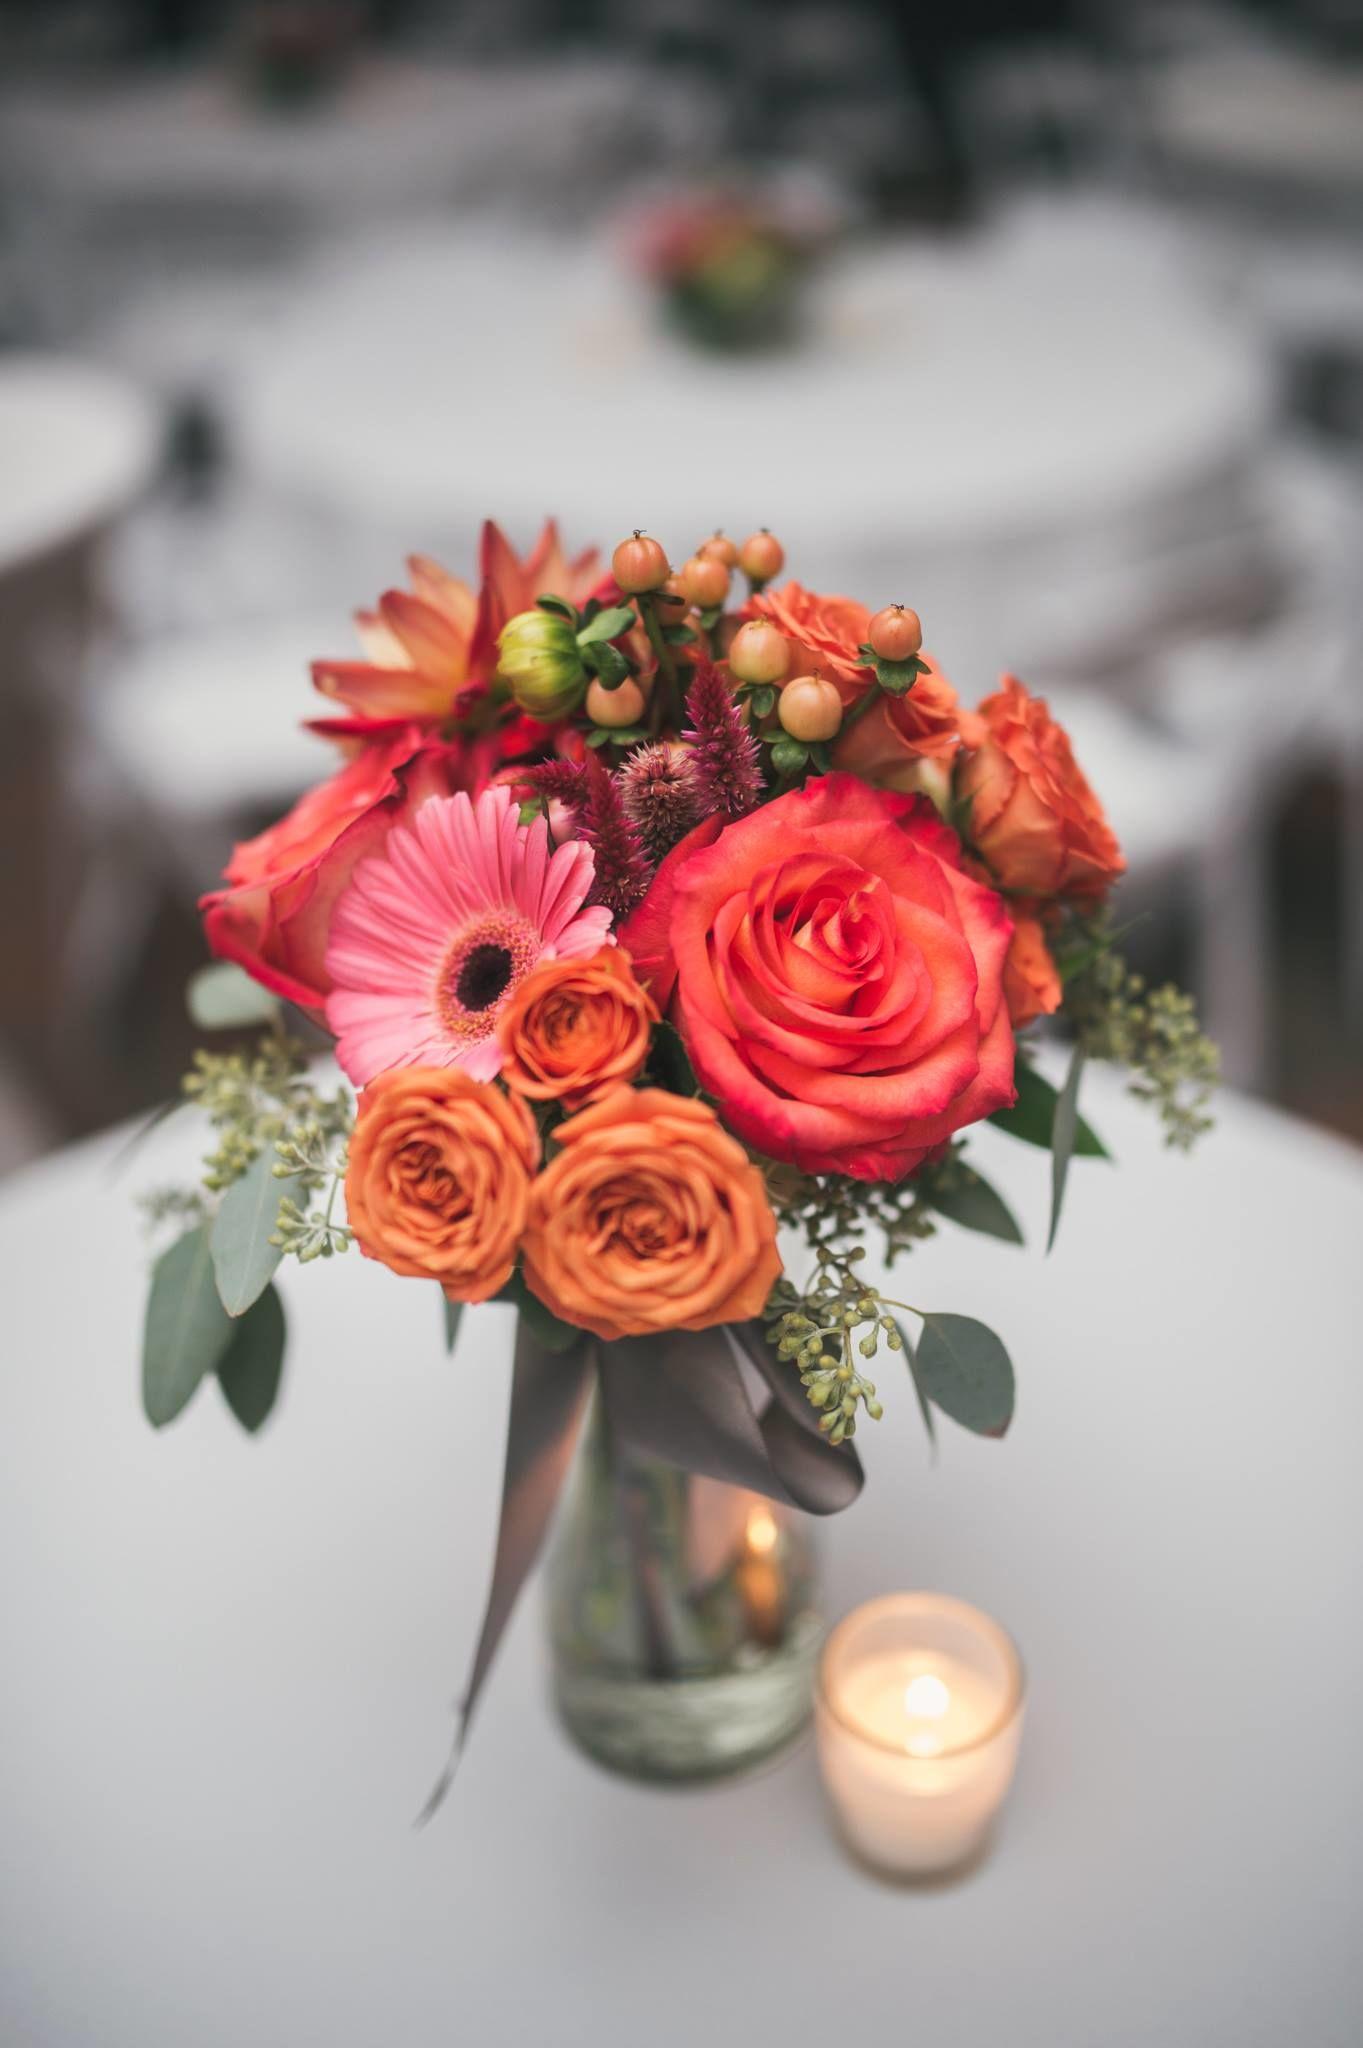 Rebel Hill Florist Wedding Day Center Piece Photo Gallery